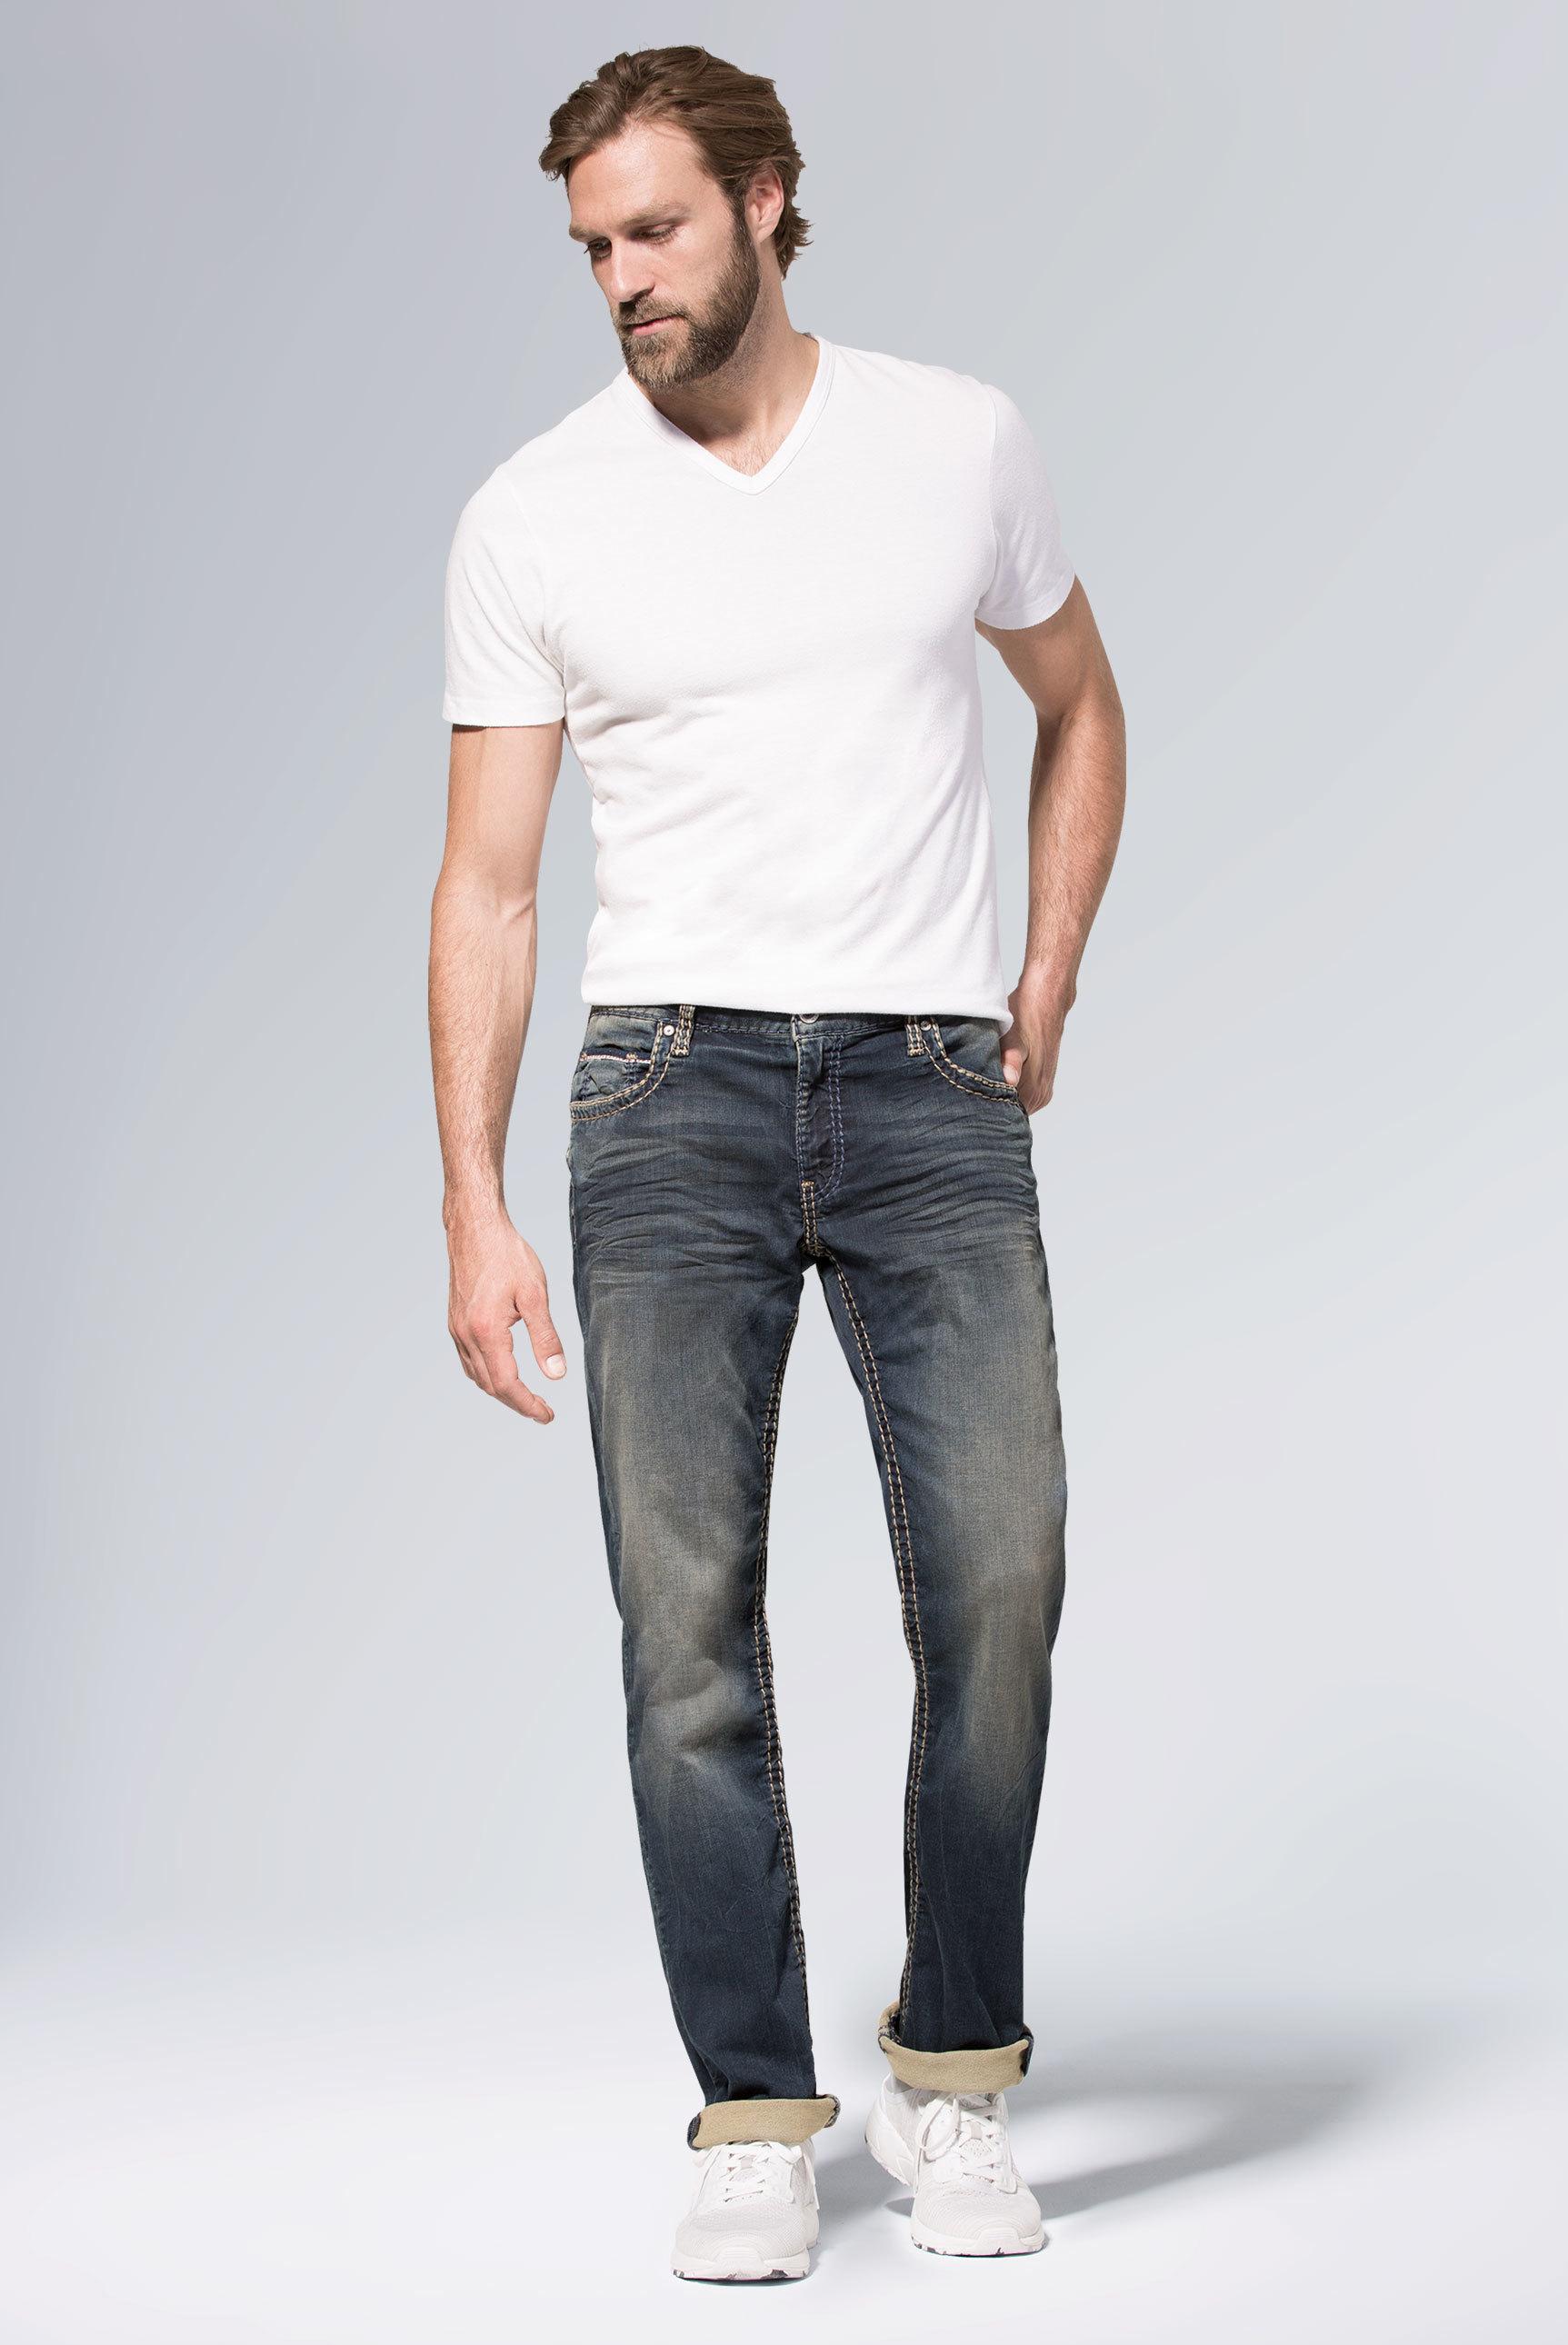 Sweatmaterial im Denim Look Jeans CO:NO